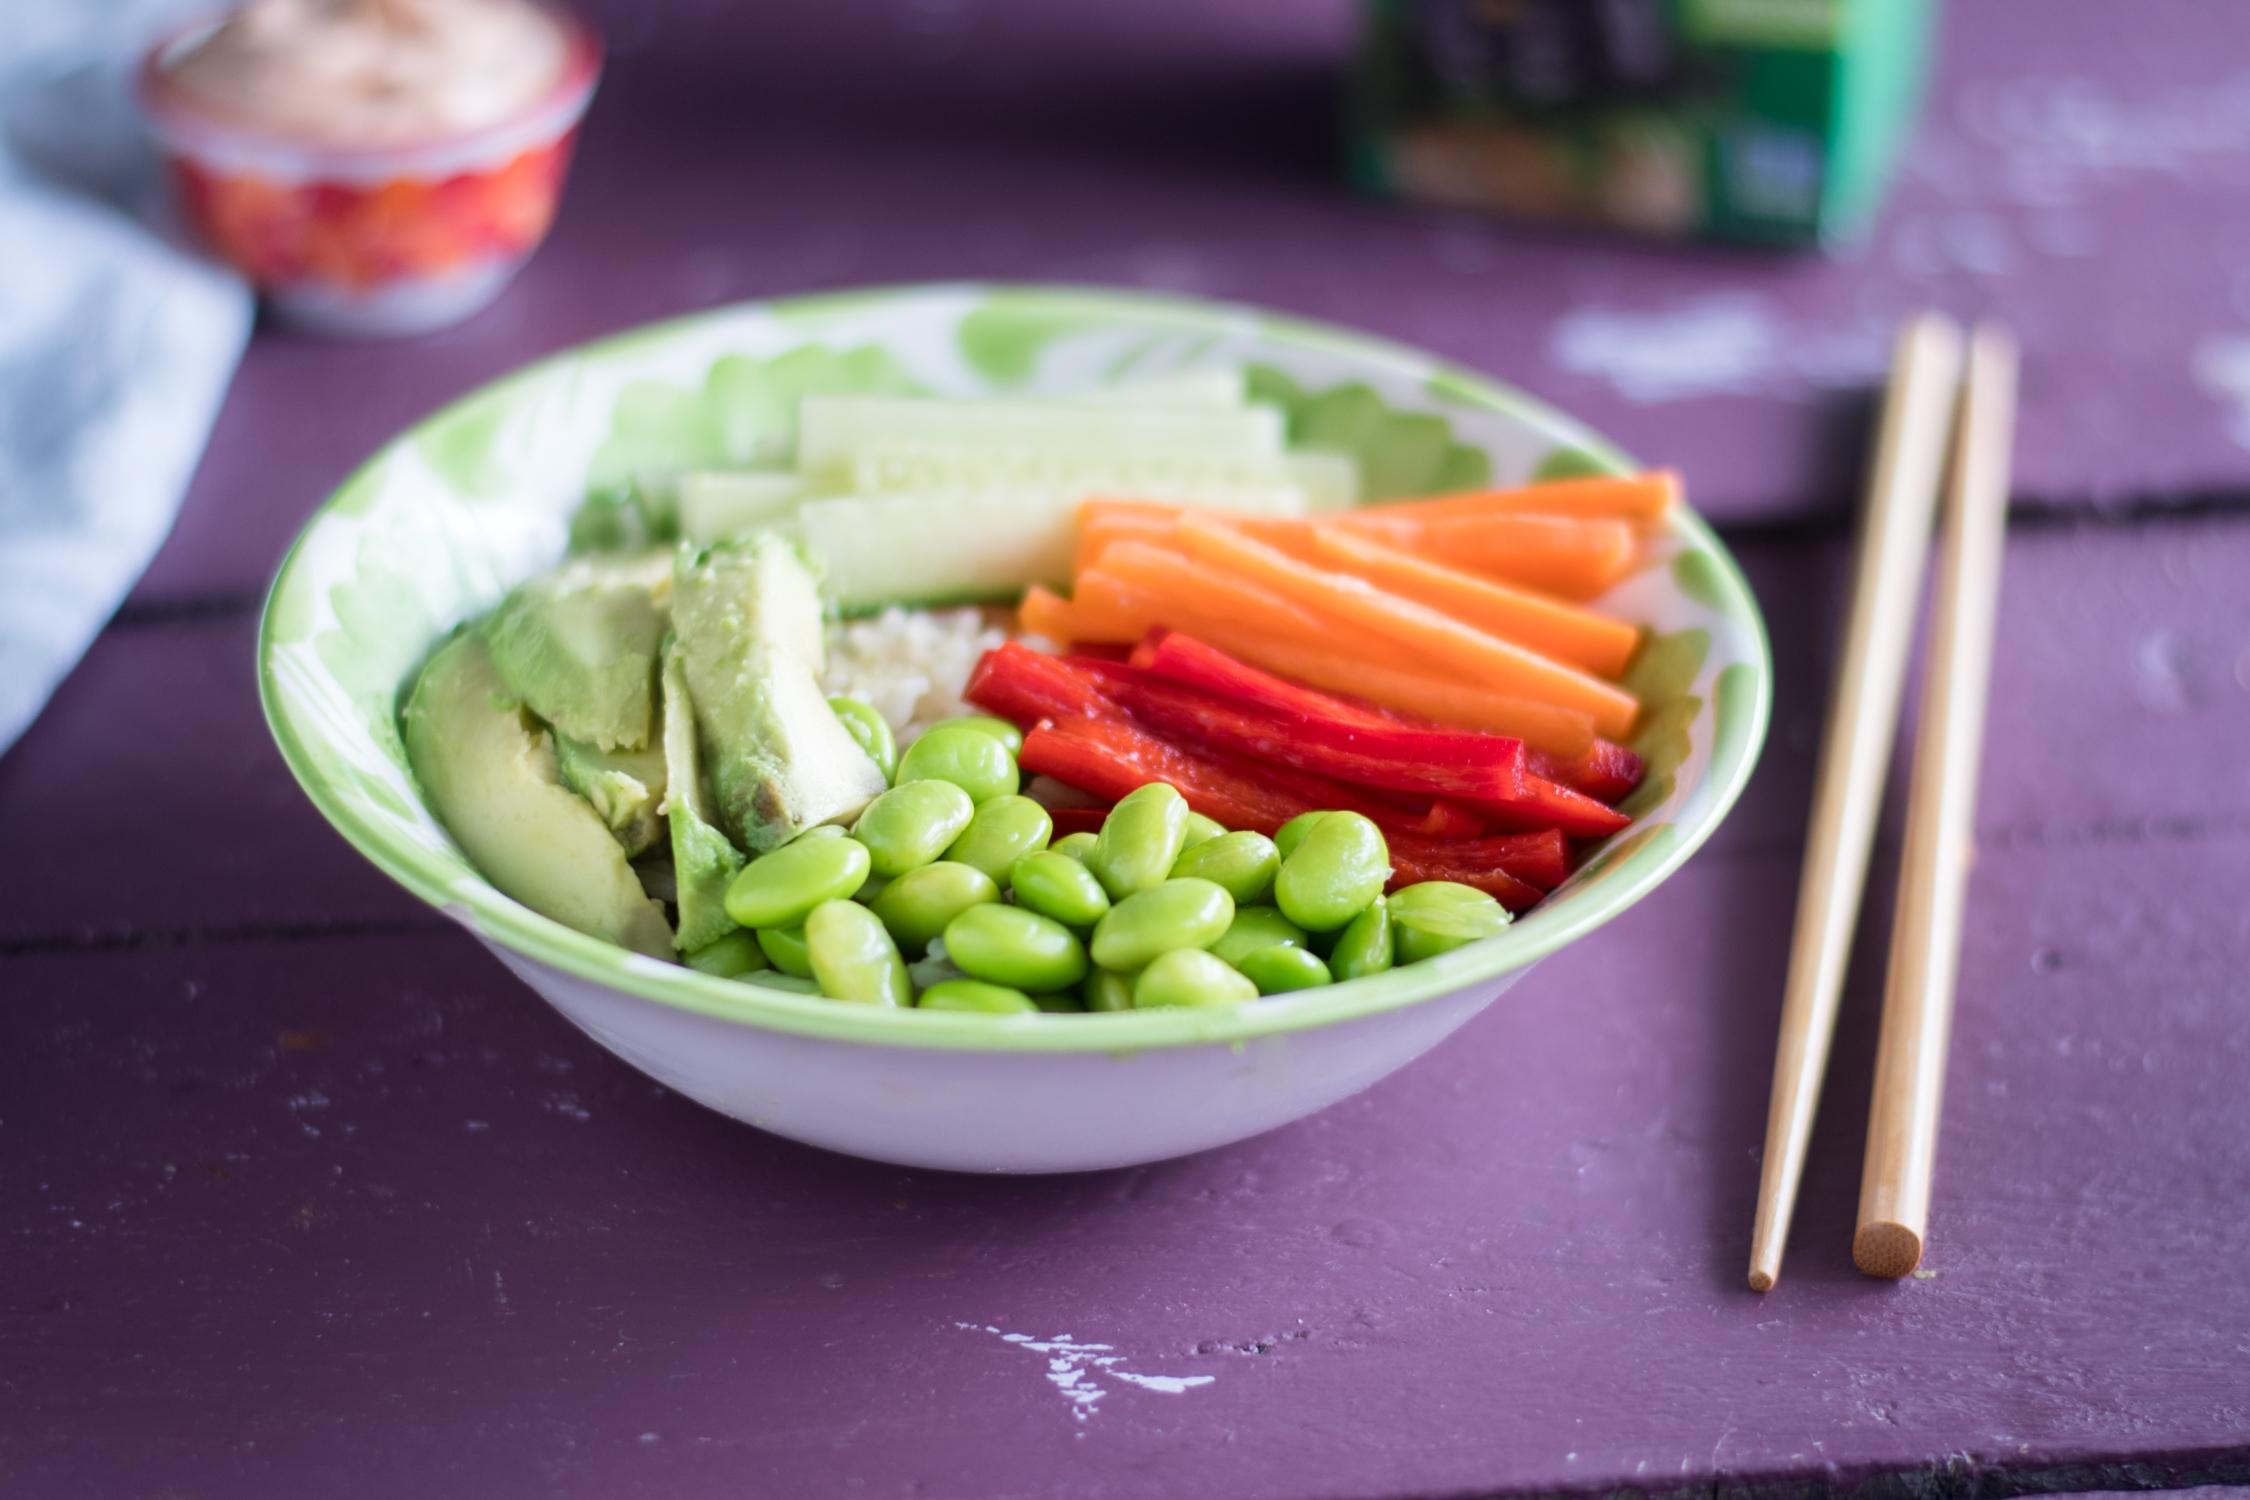 Vegan Sushi Bowls made with green tea infused rice. #vegan #tea #rice #recipes